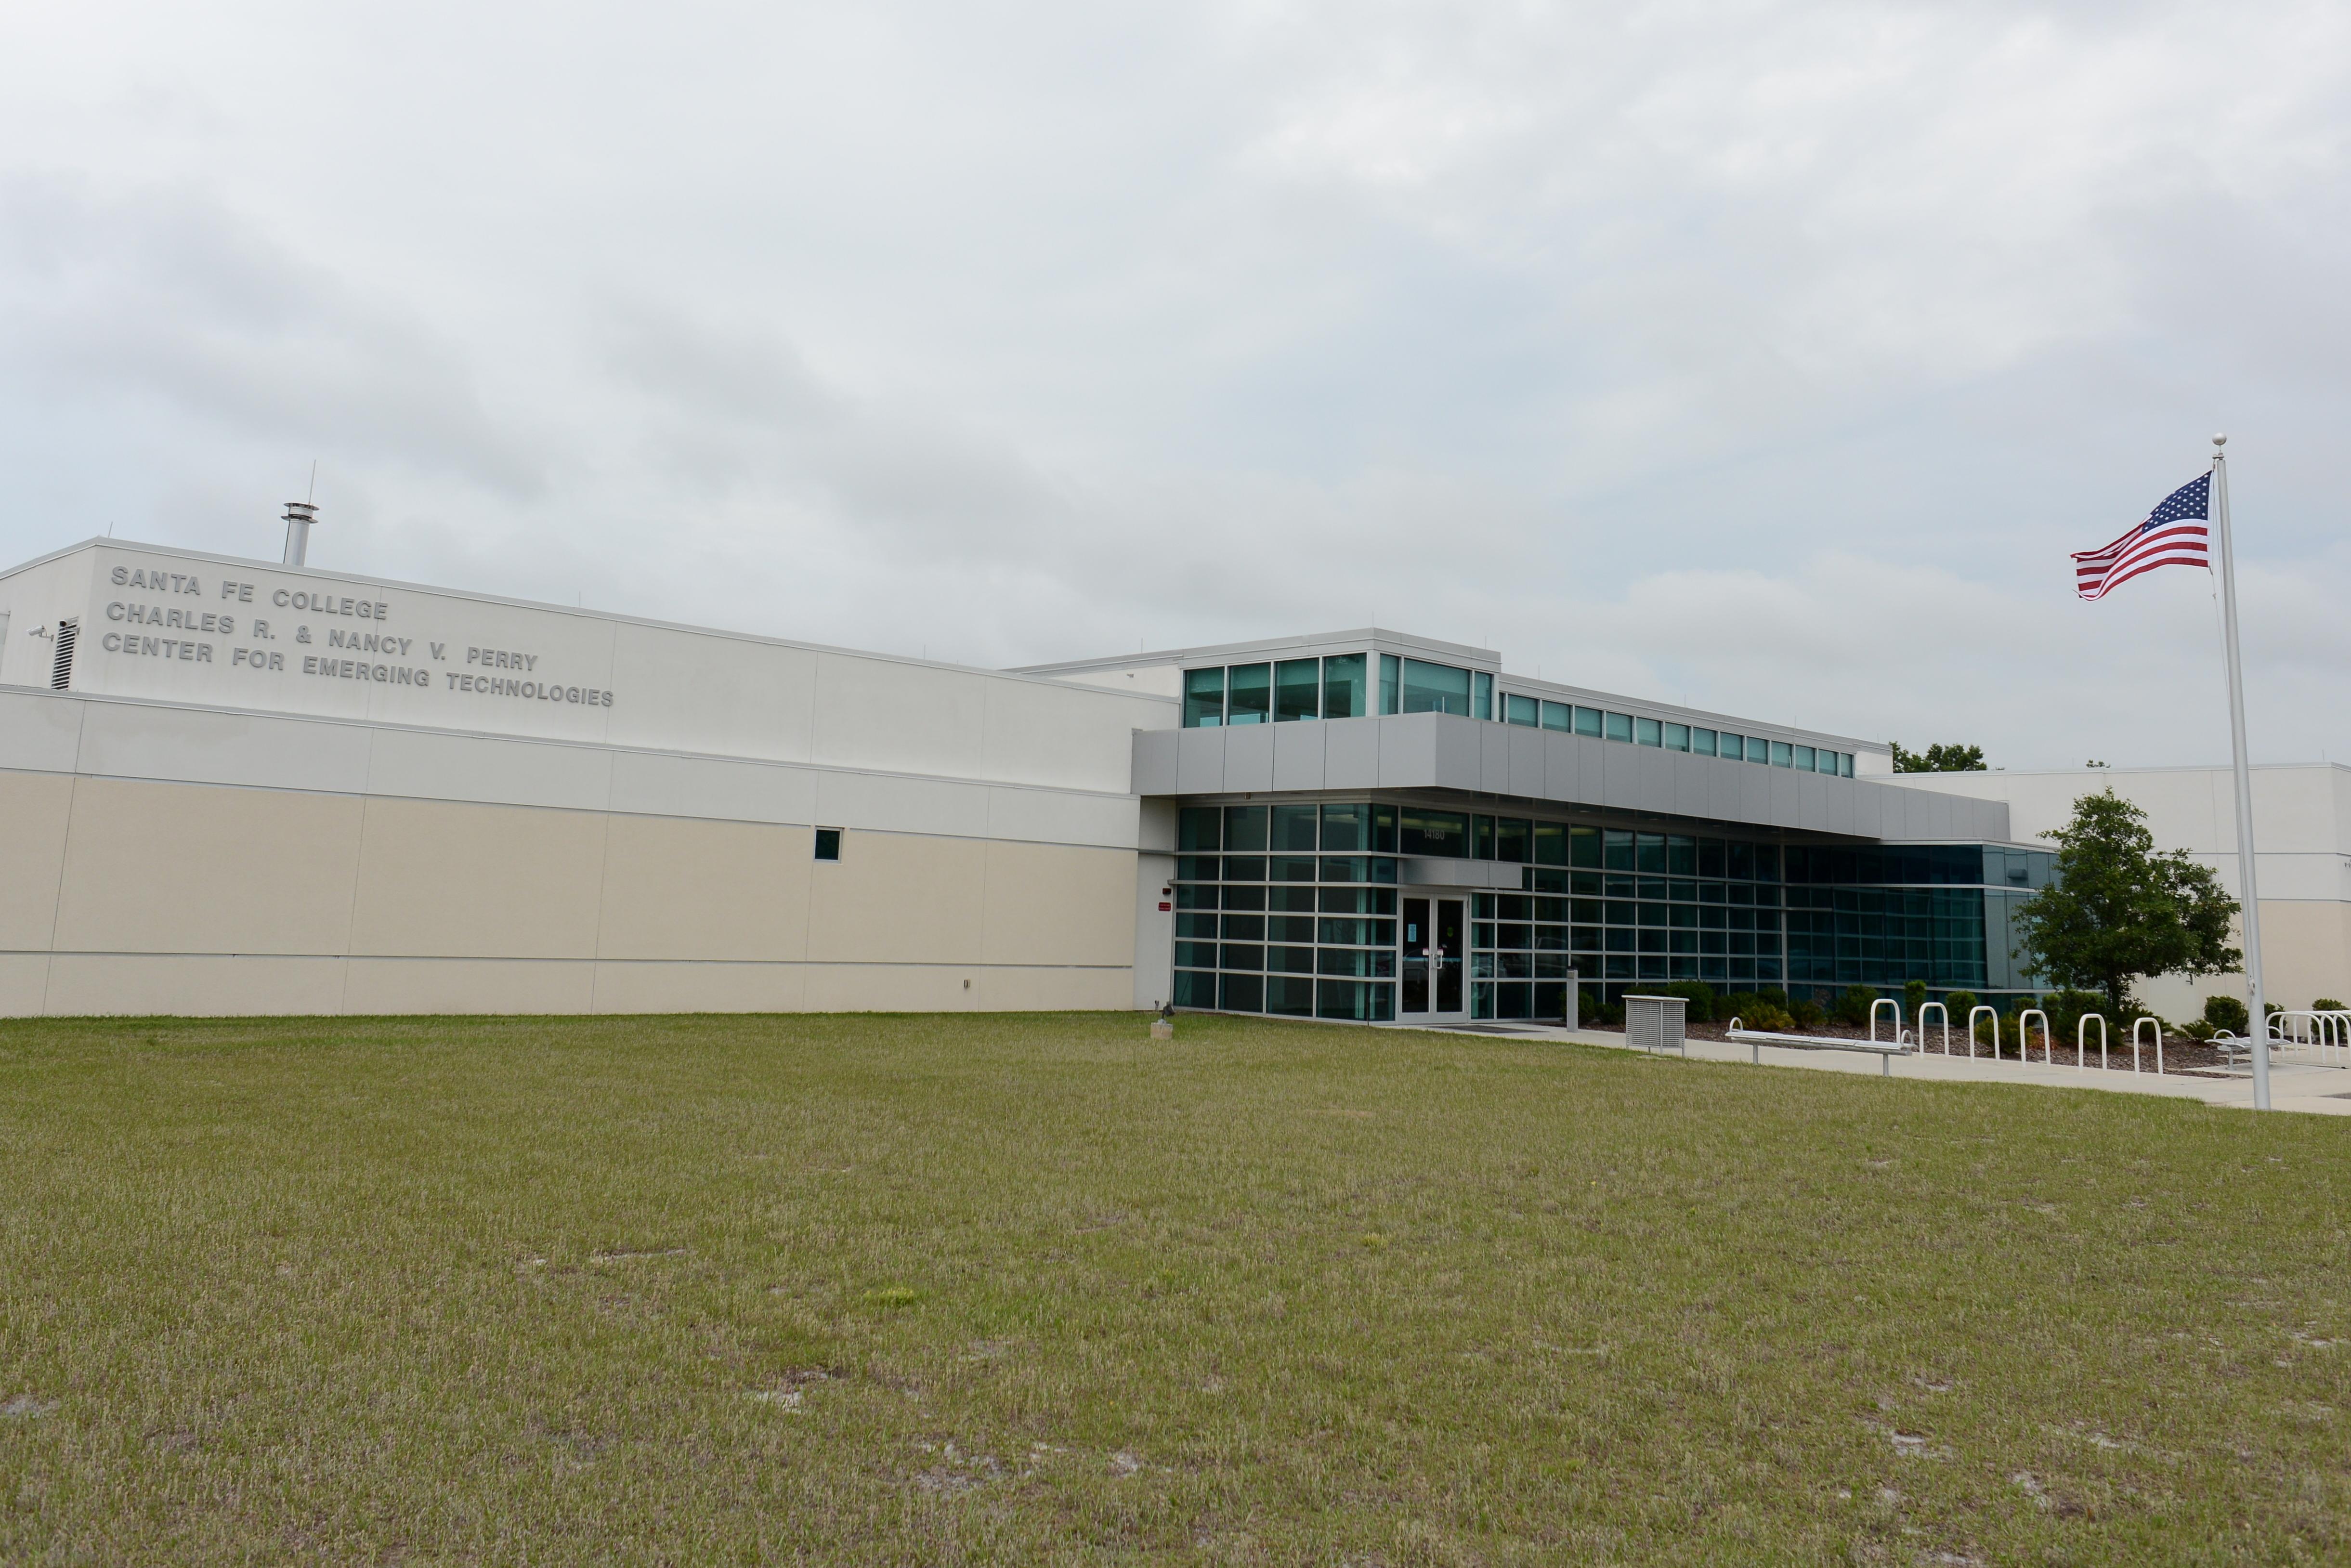 Santa Fe College's Biotech Program Fuels Area's Tech Boom - HOME